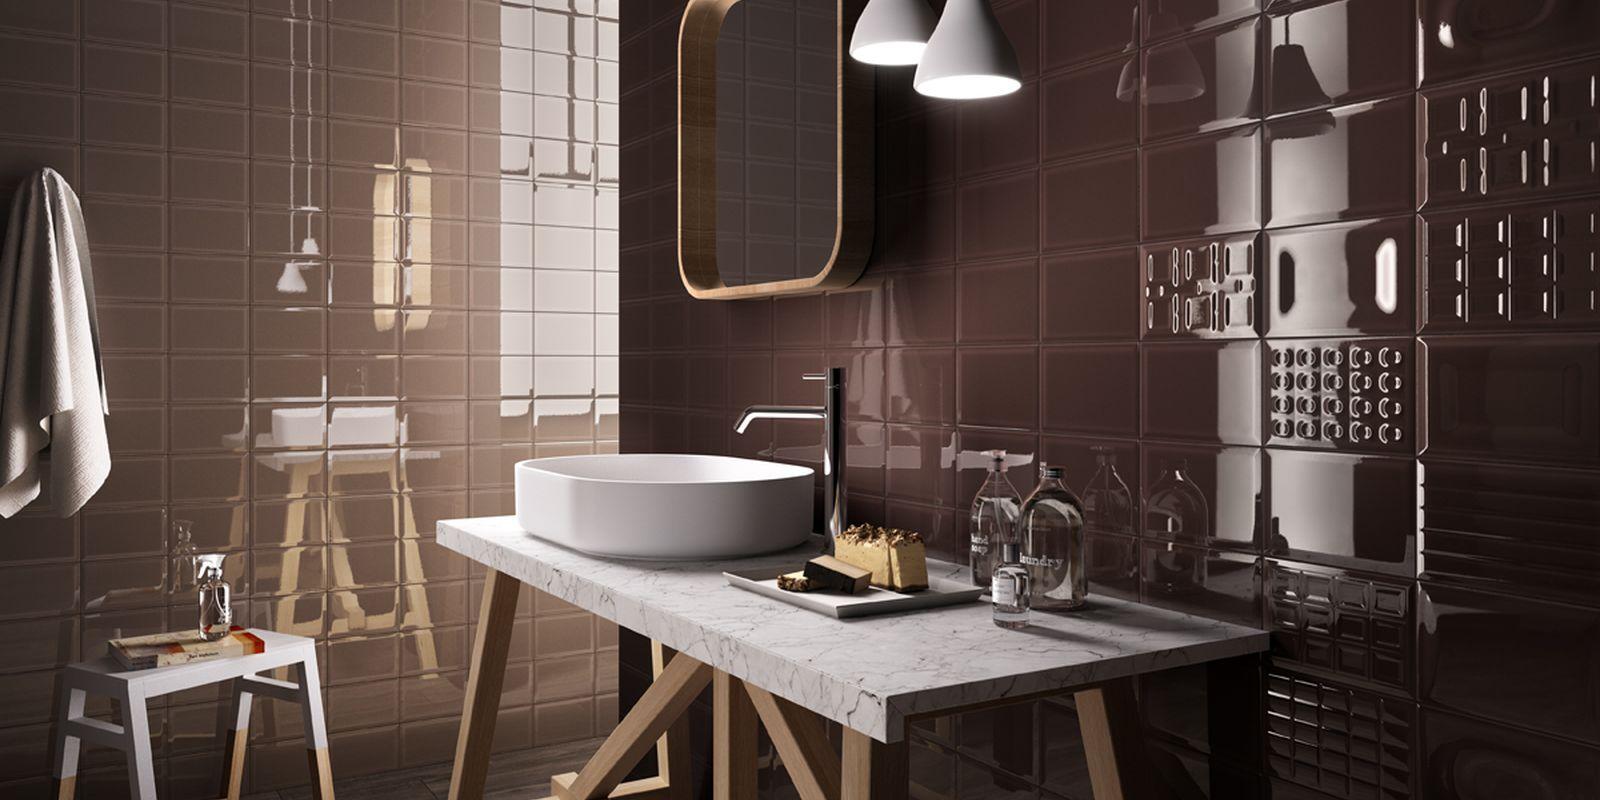 Imola - Genesee Ceramic Tile